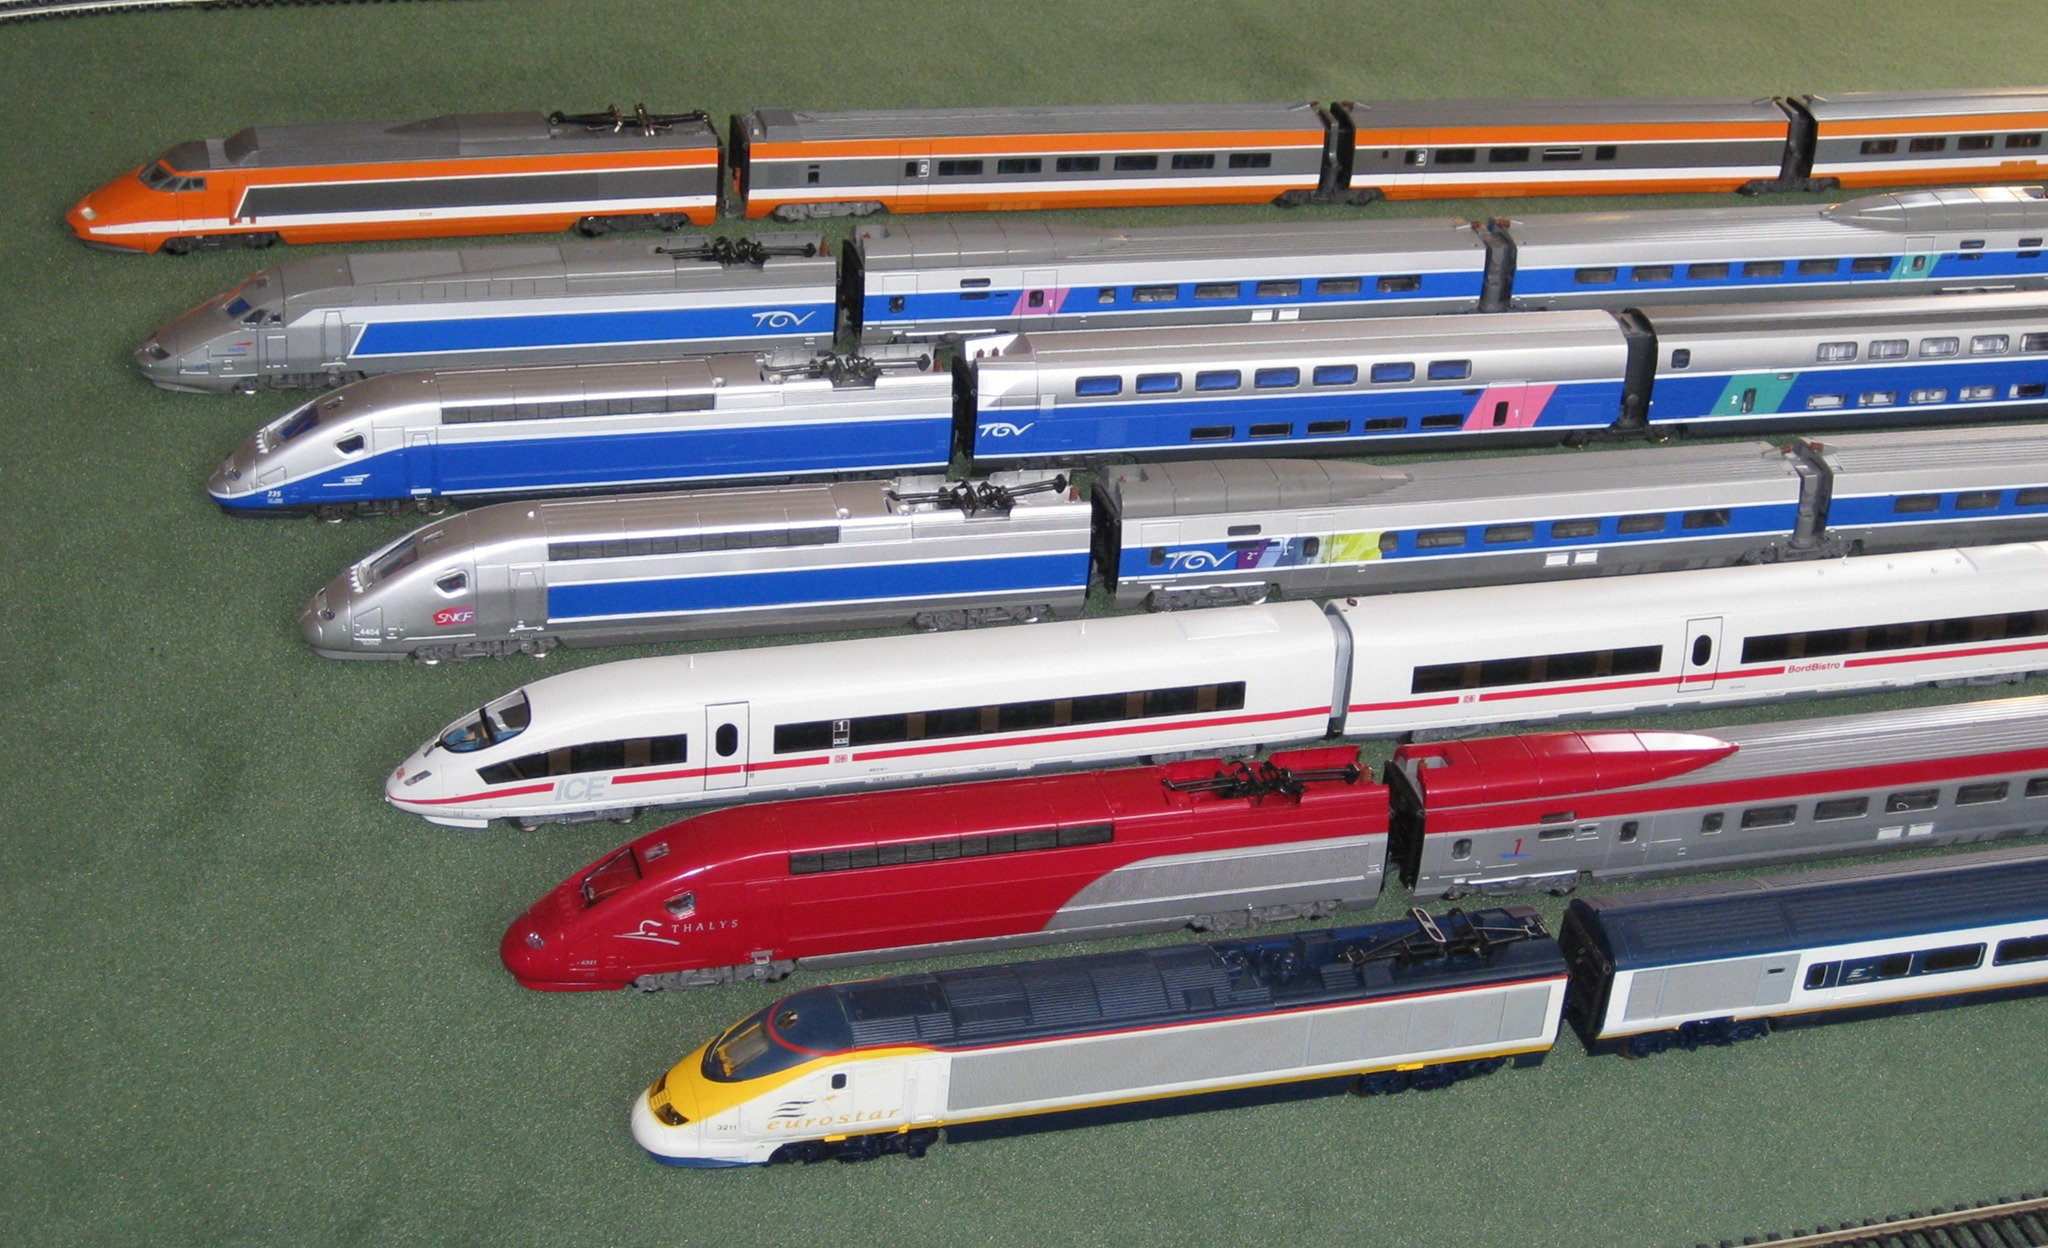 Tag tgv les trains miniatures de glr page 2 for Interieur ouigo